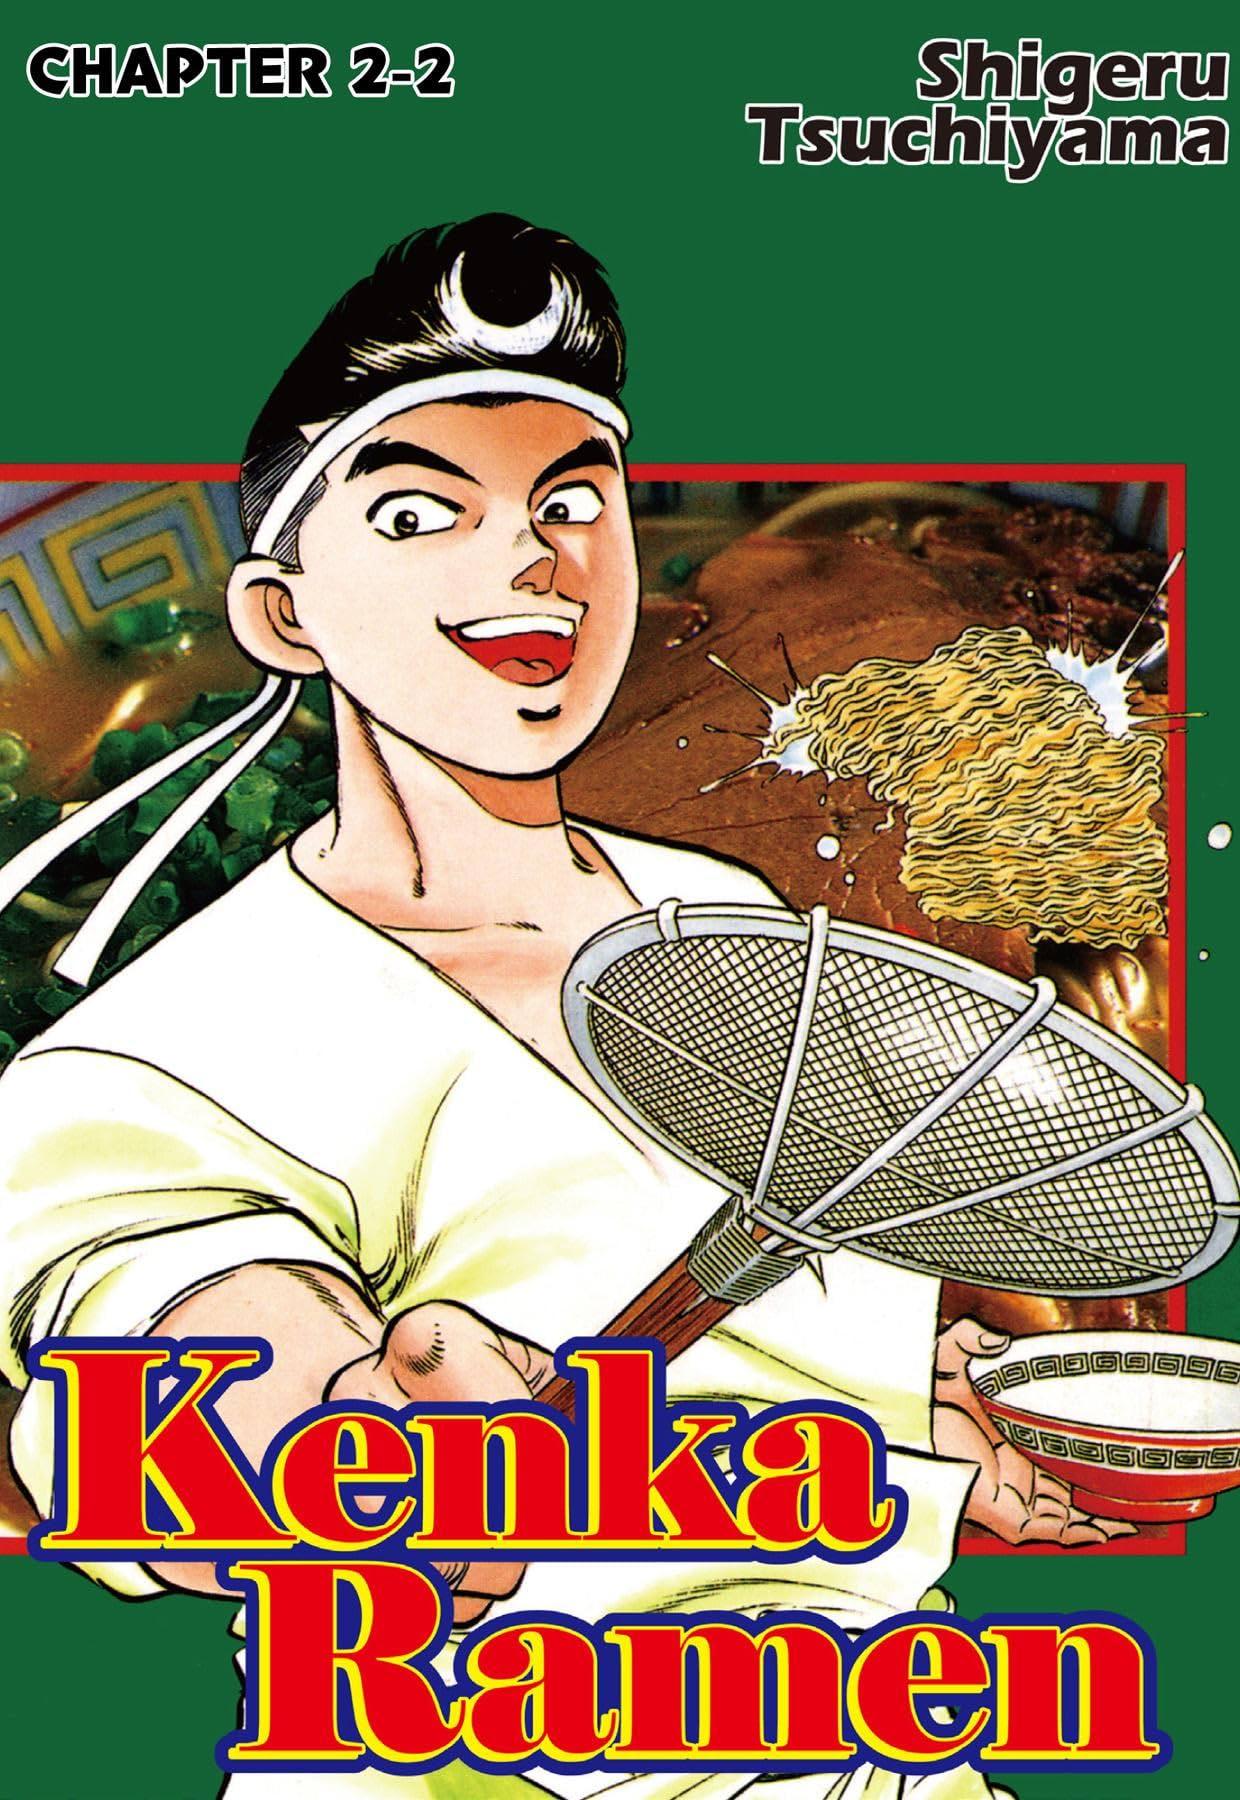 KENKA RAMEN #11